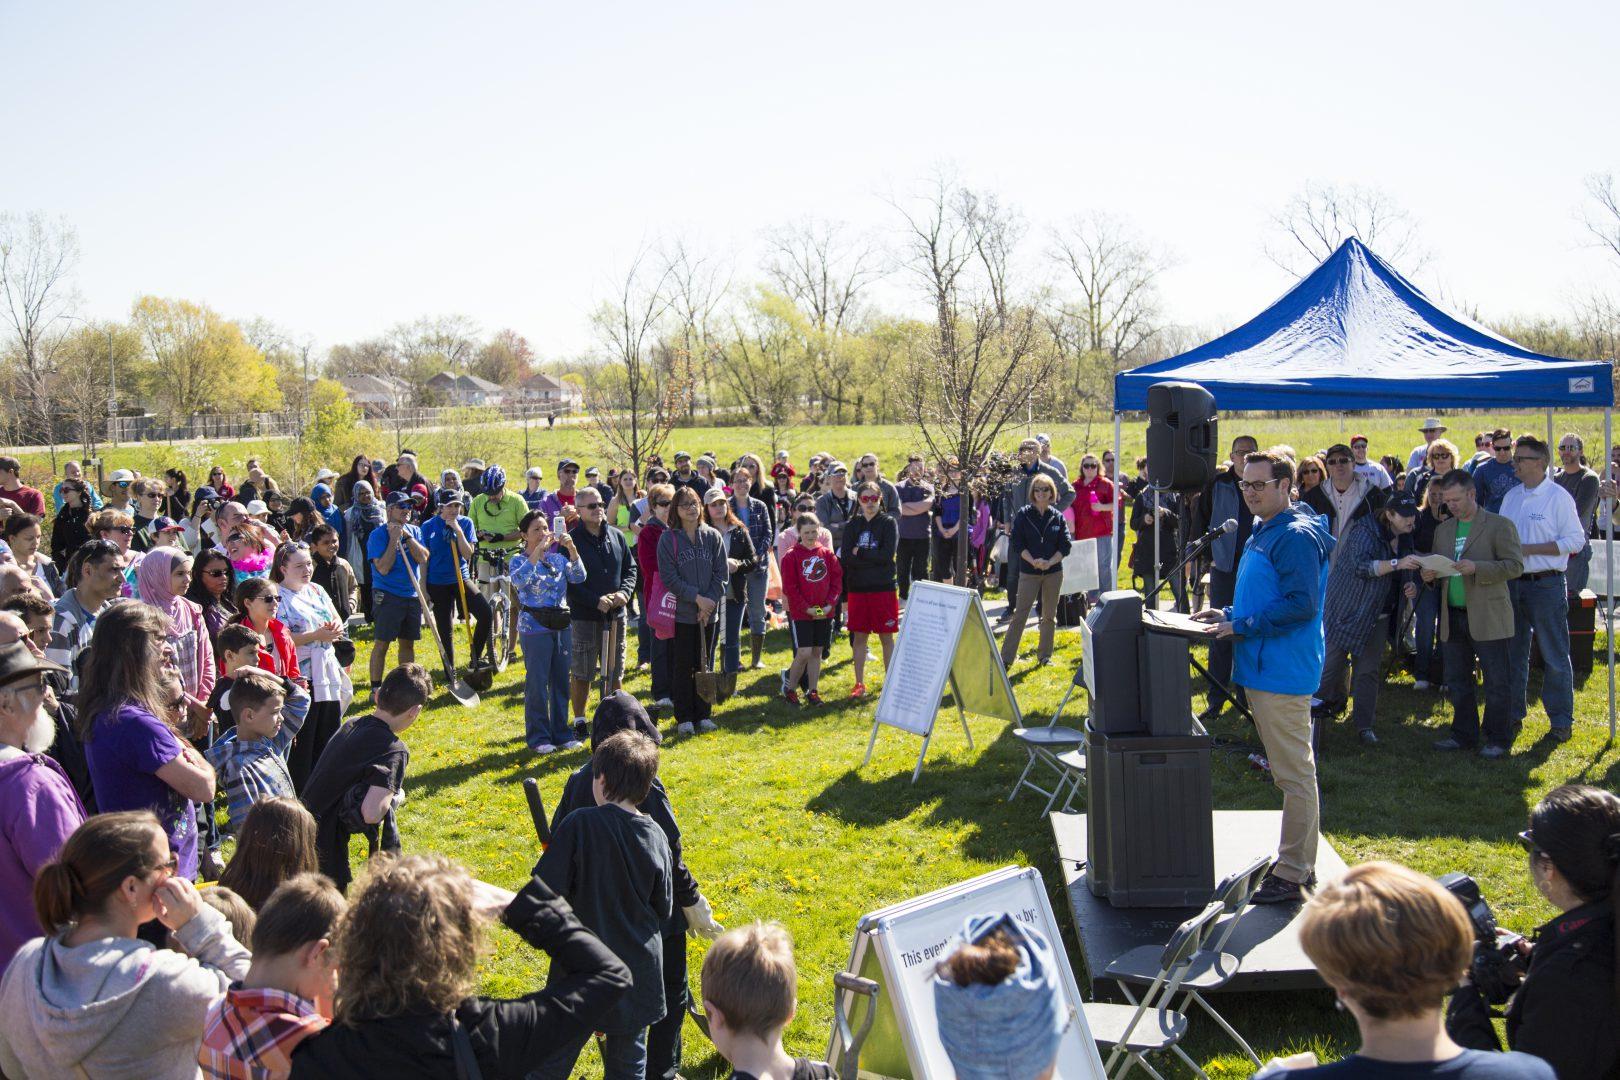 People gathered around a public speaker